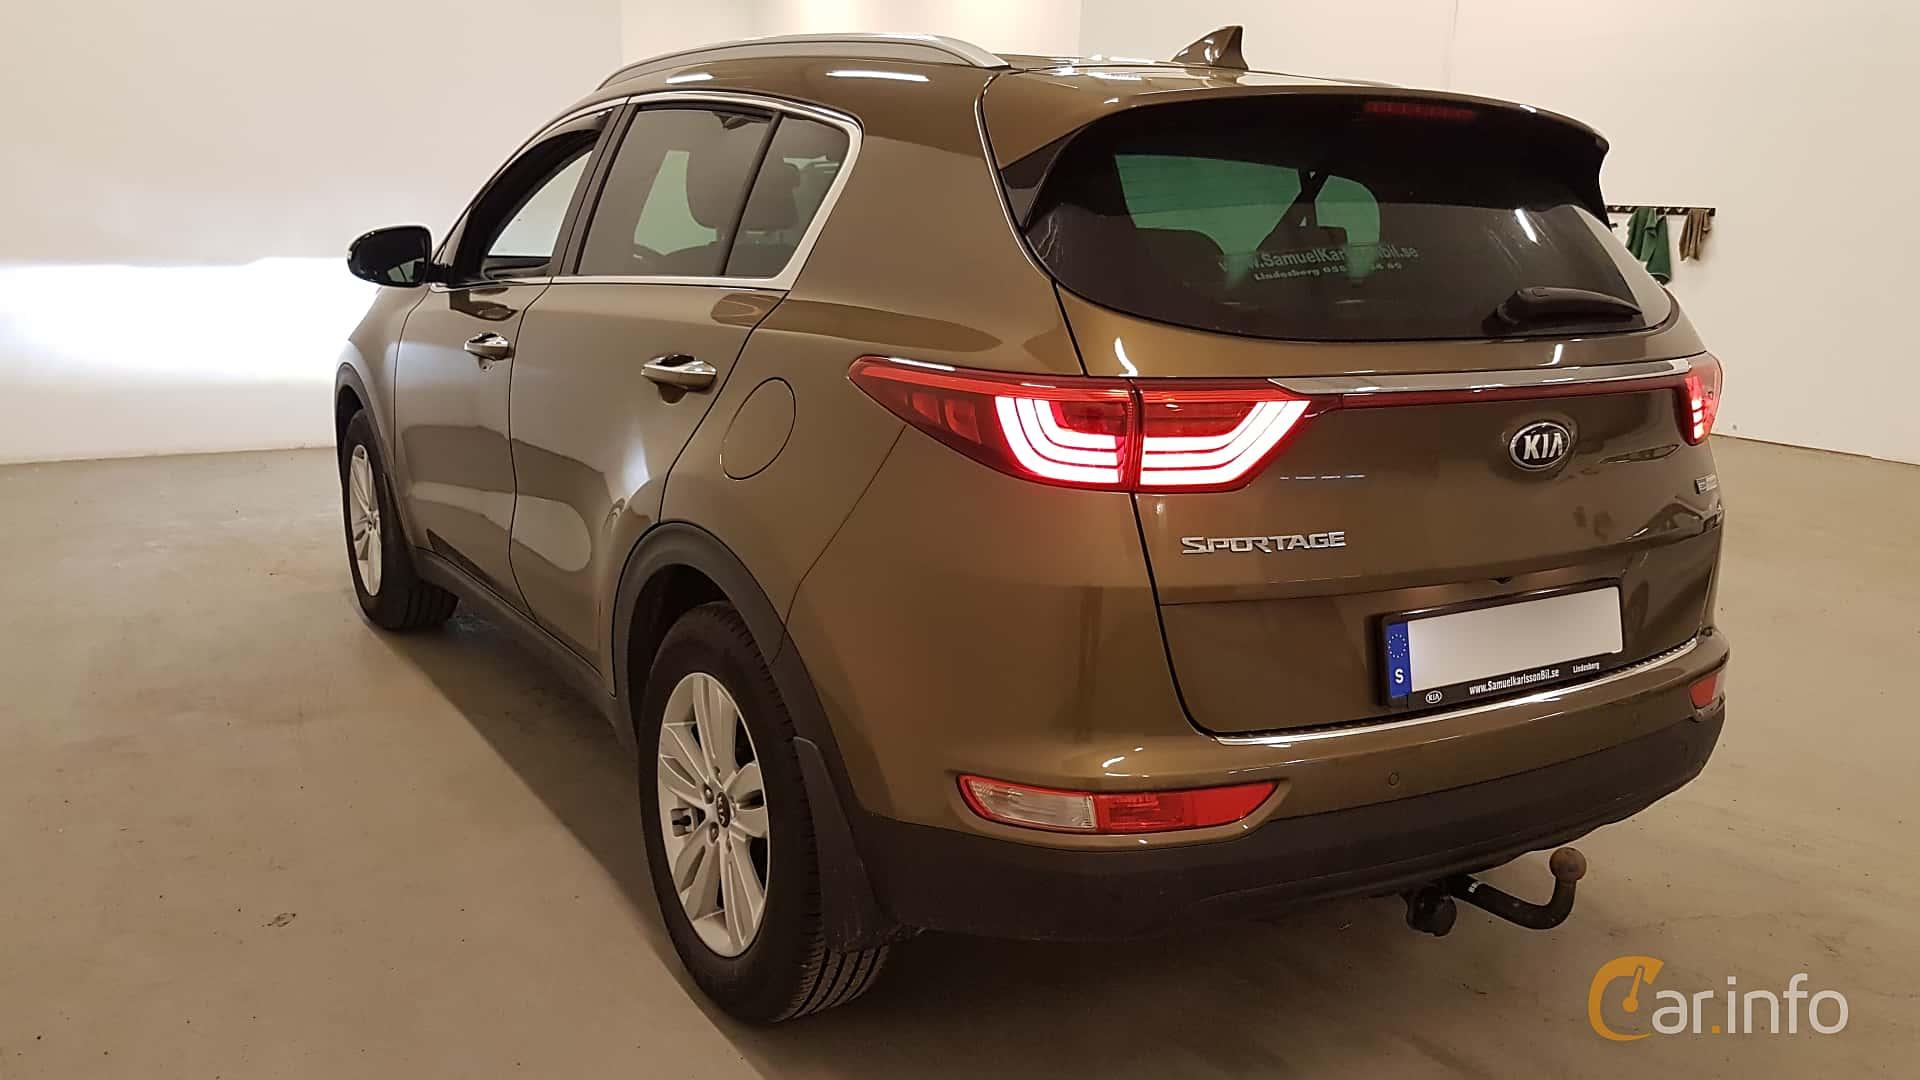 Kia Sportage 1.7 CRDi DCT, 141hp, 2017